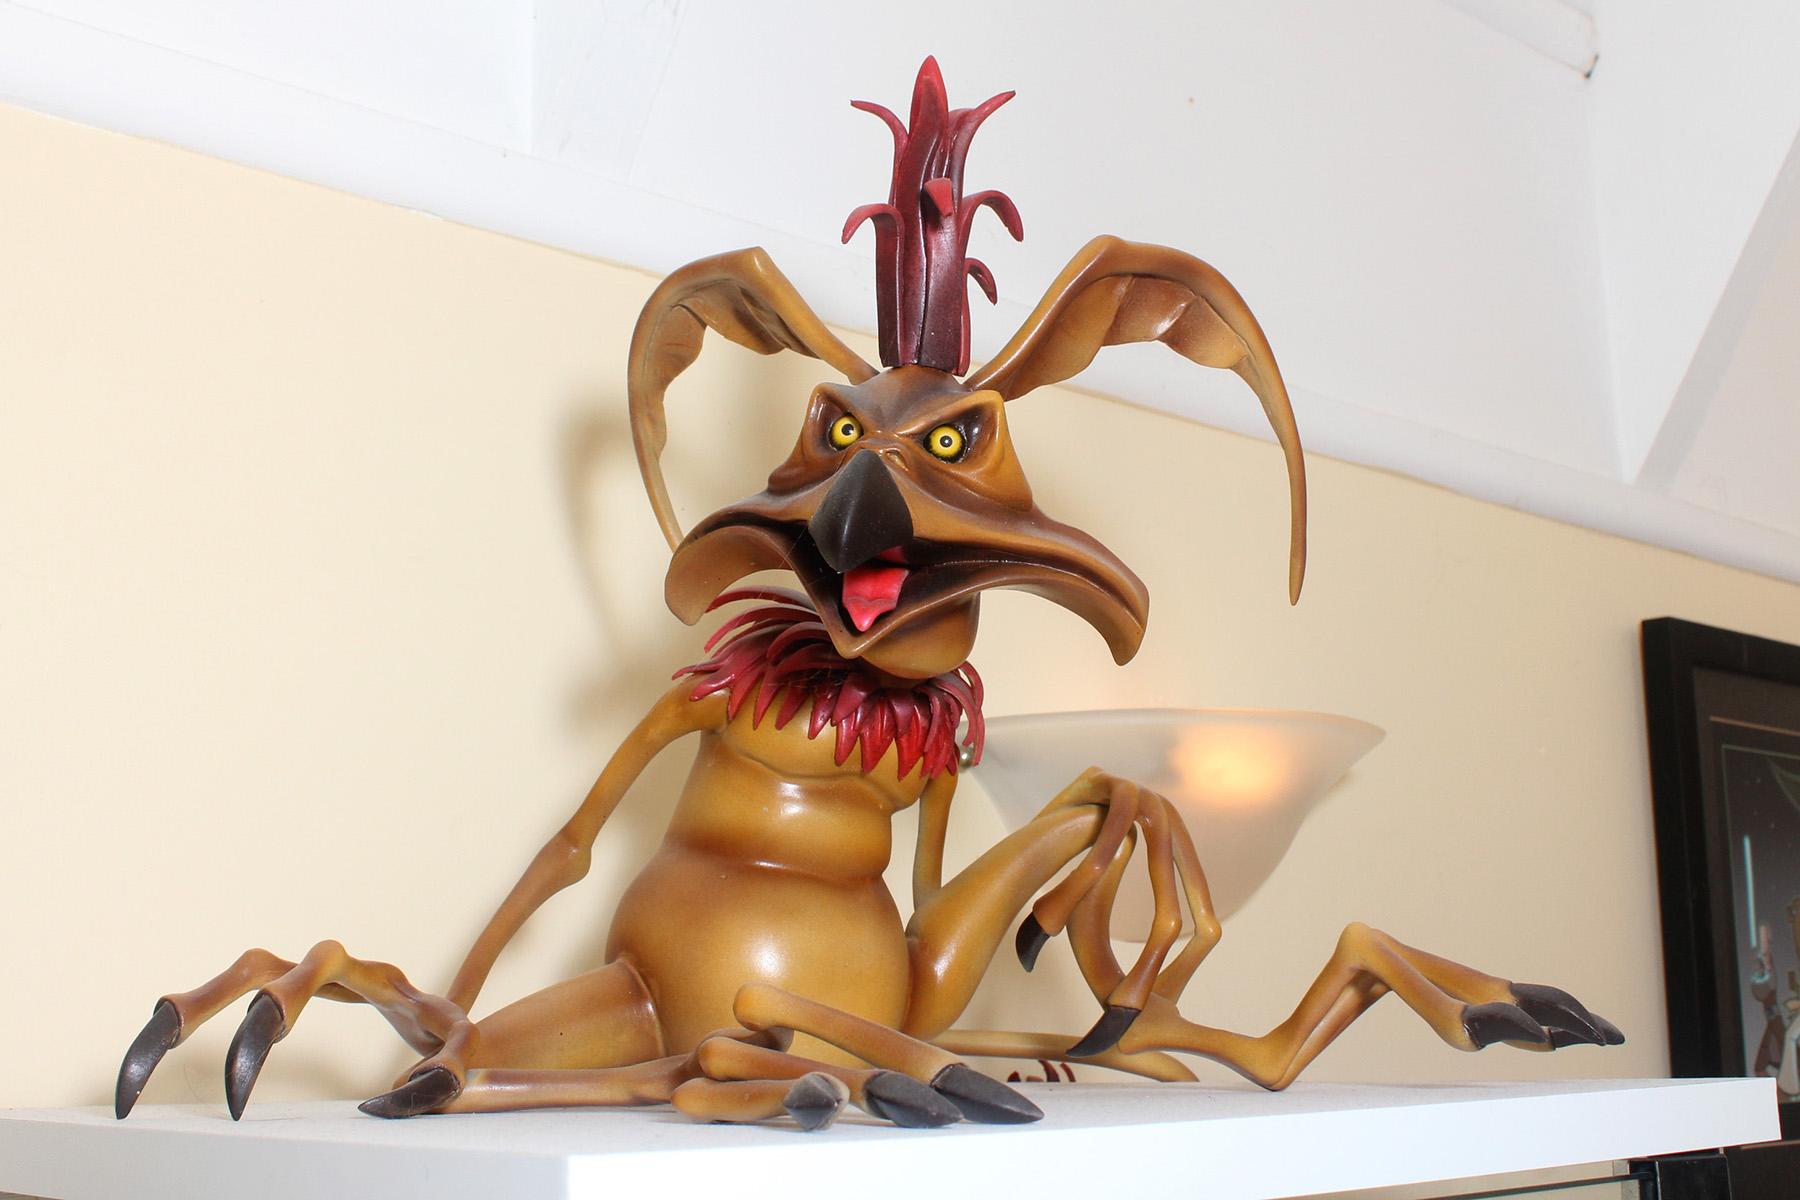 Animated Salacious Crumb maquette